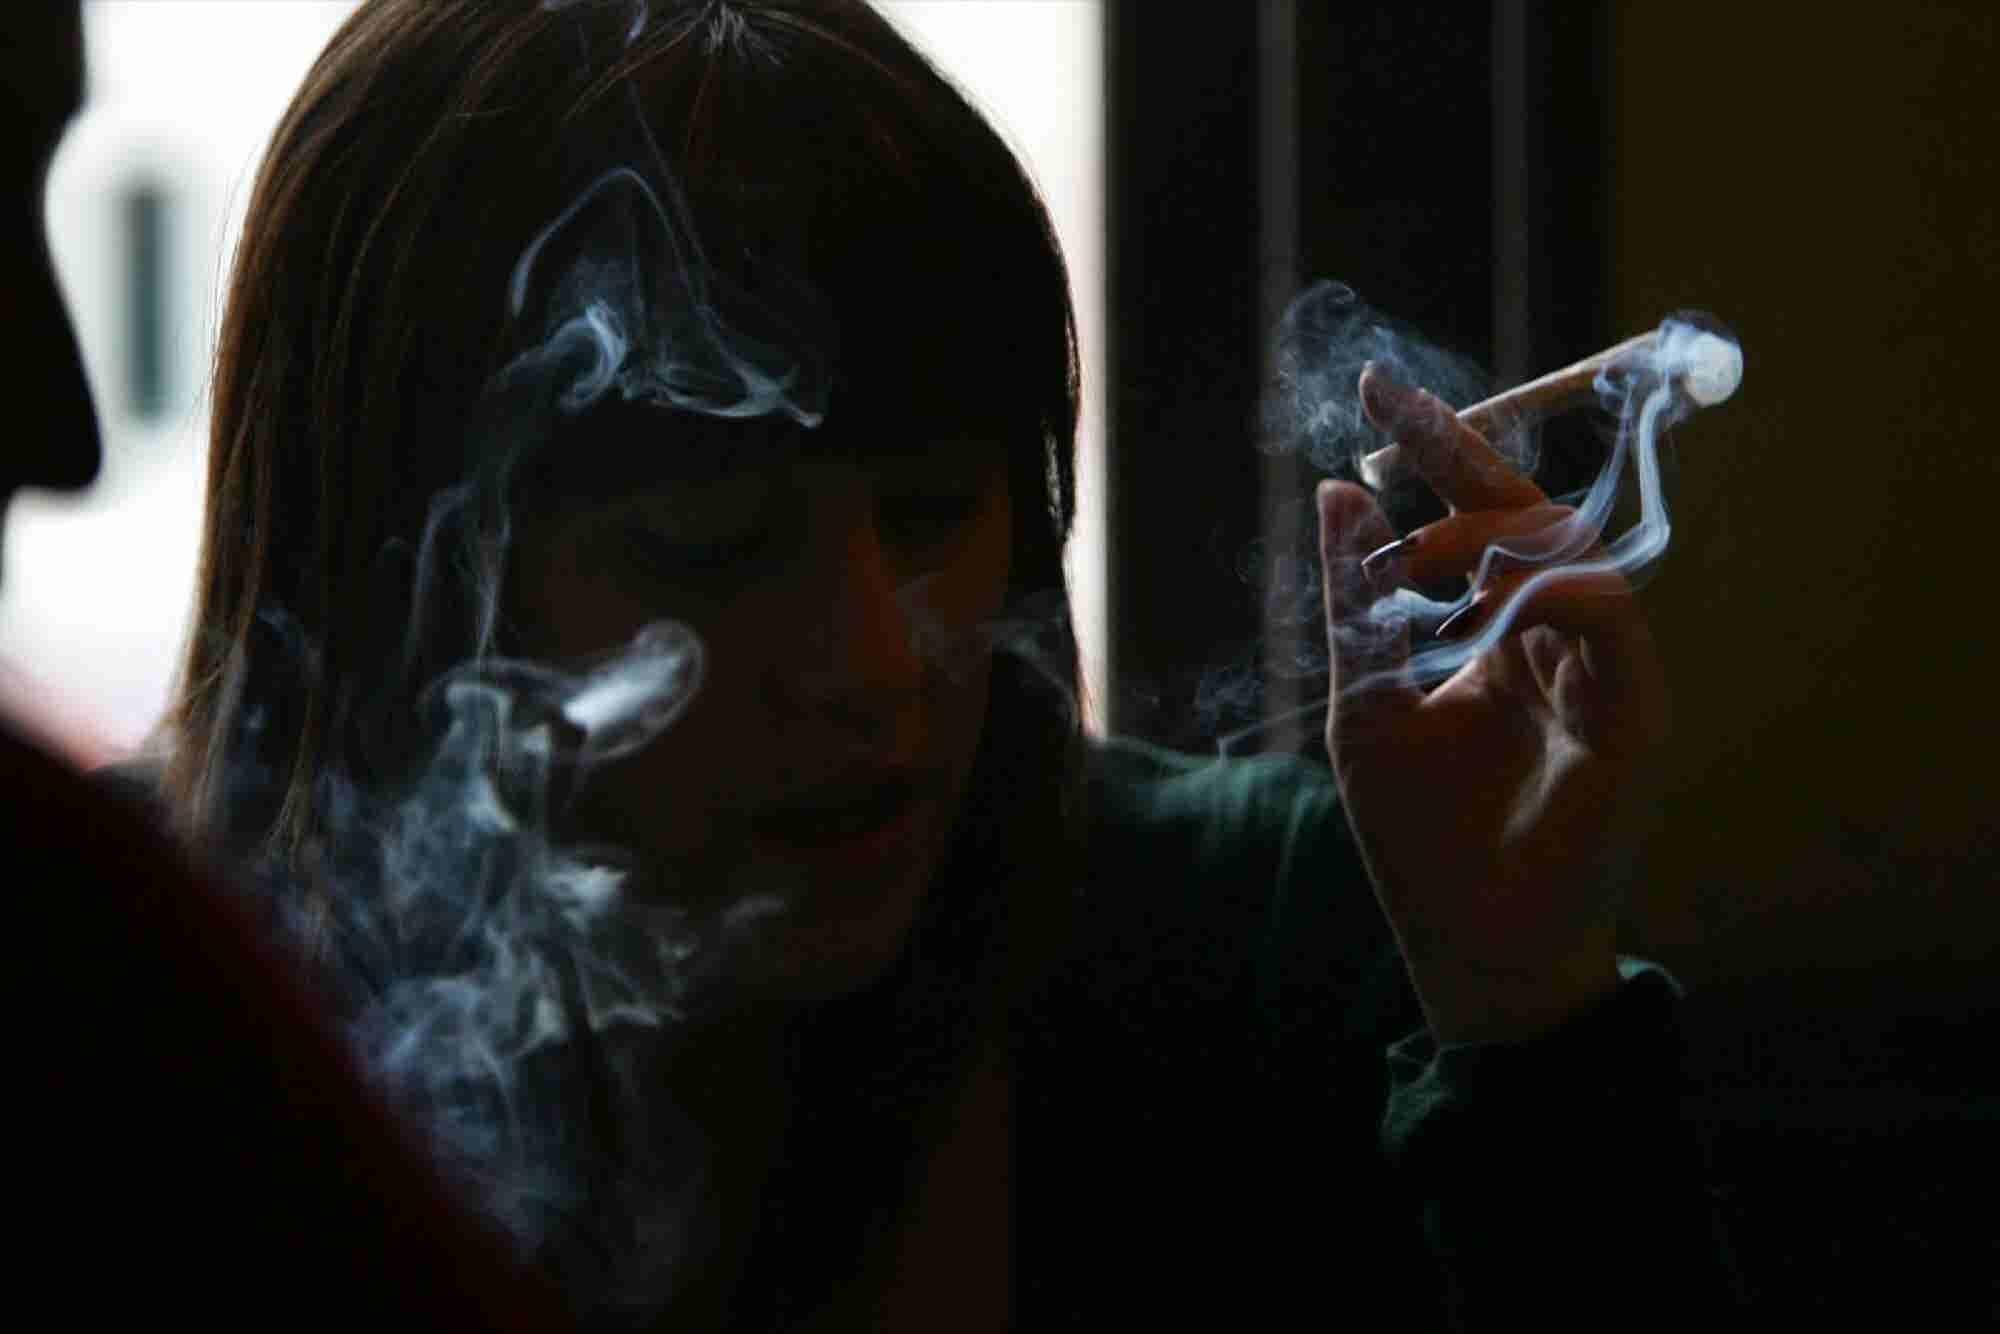 Massachusetts May Leap Ahead on Cannabis Cafes